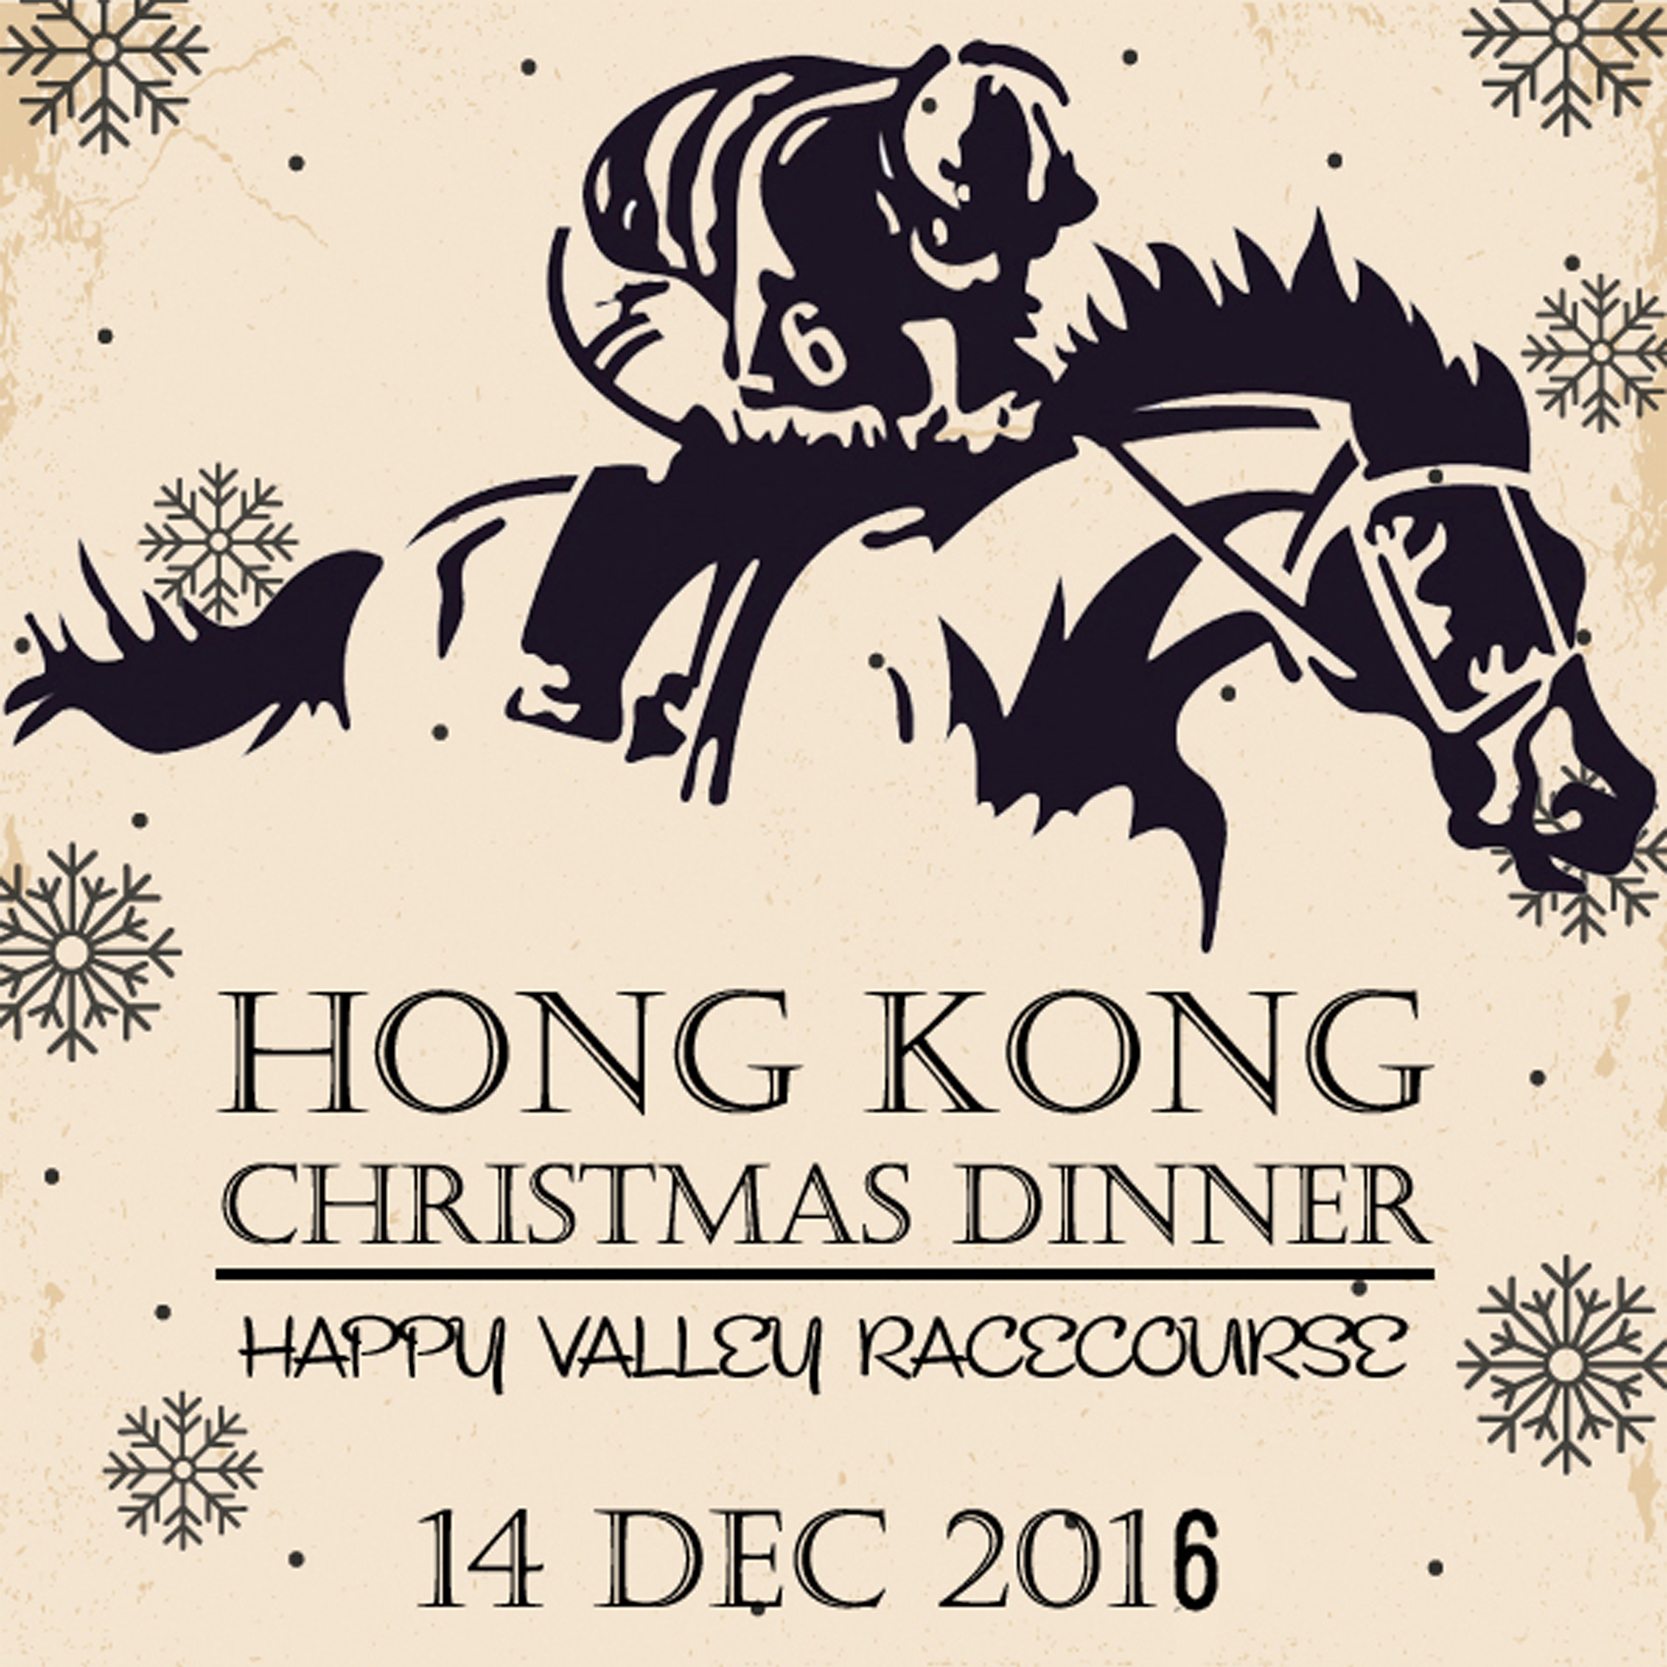 Dec 14 - Hong Kong Christmas Dinner